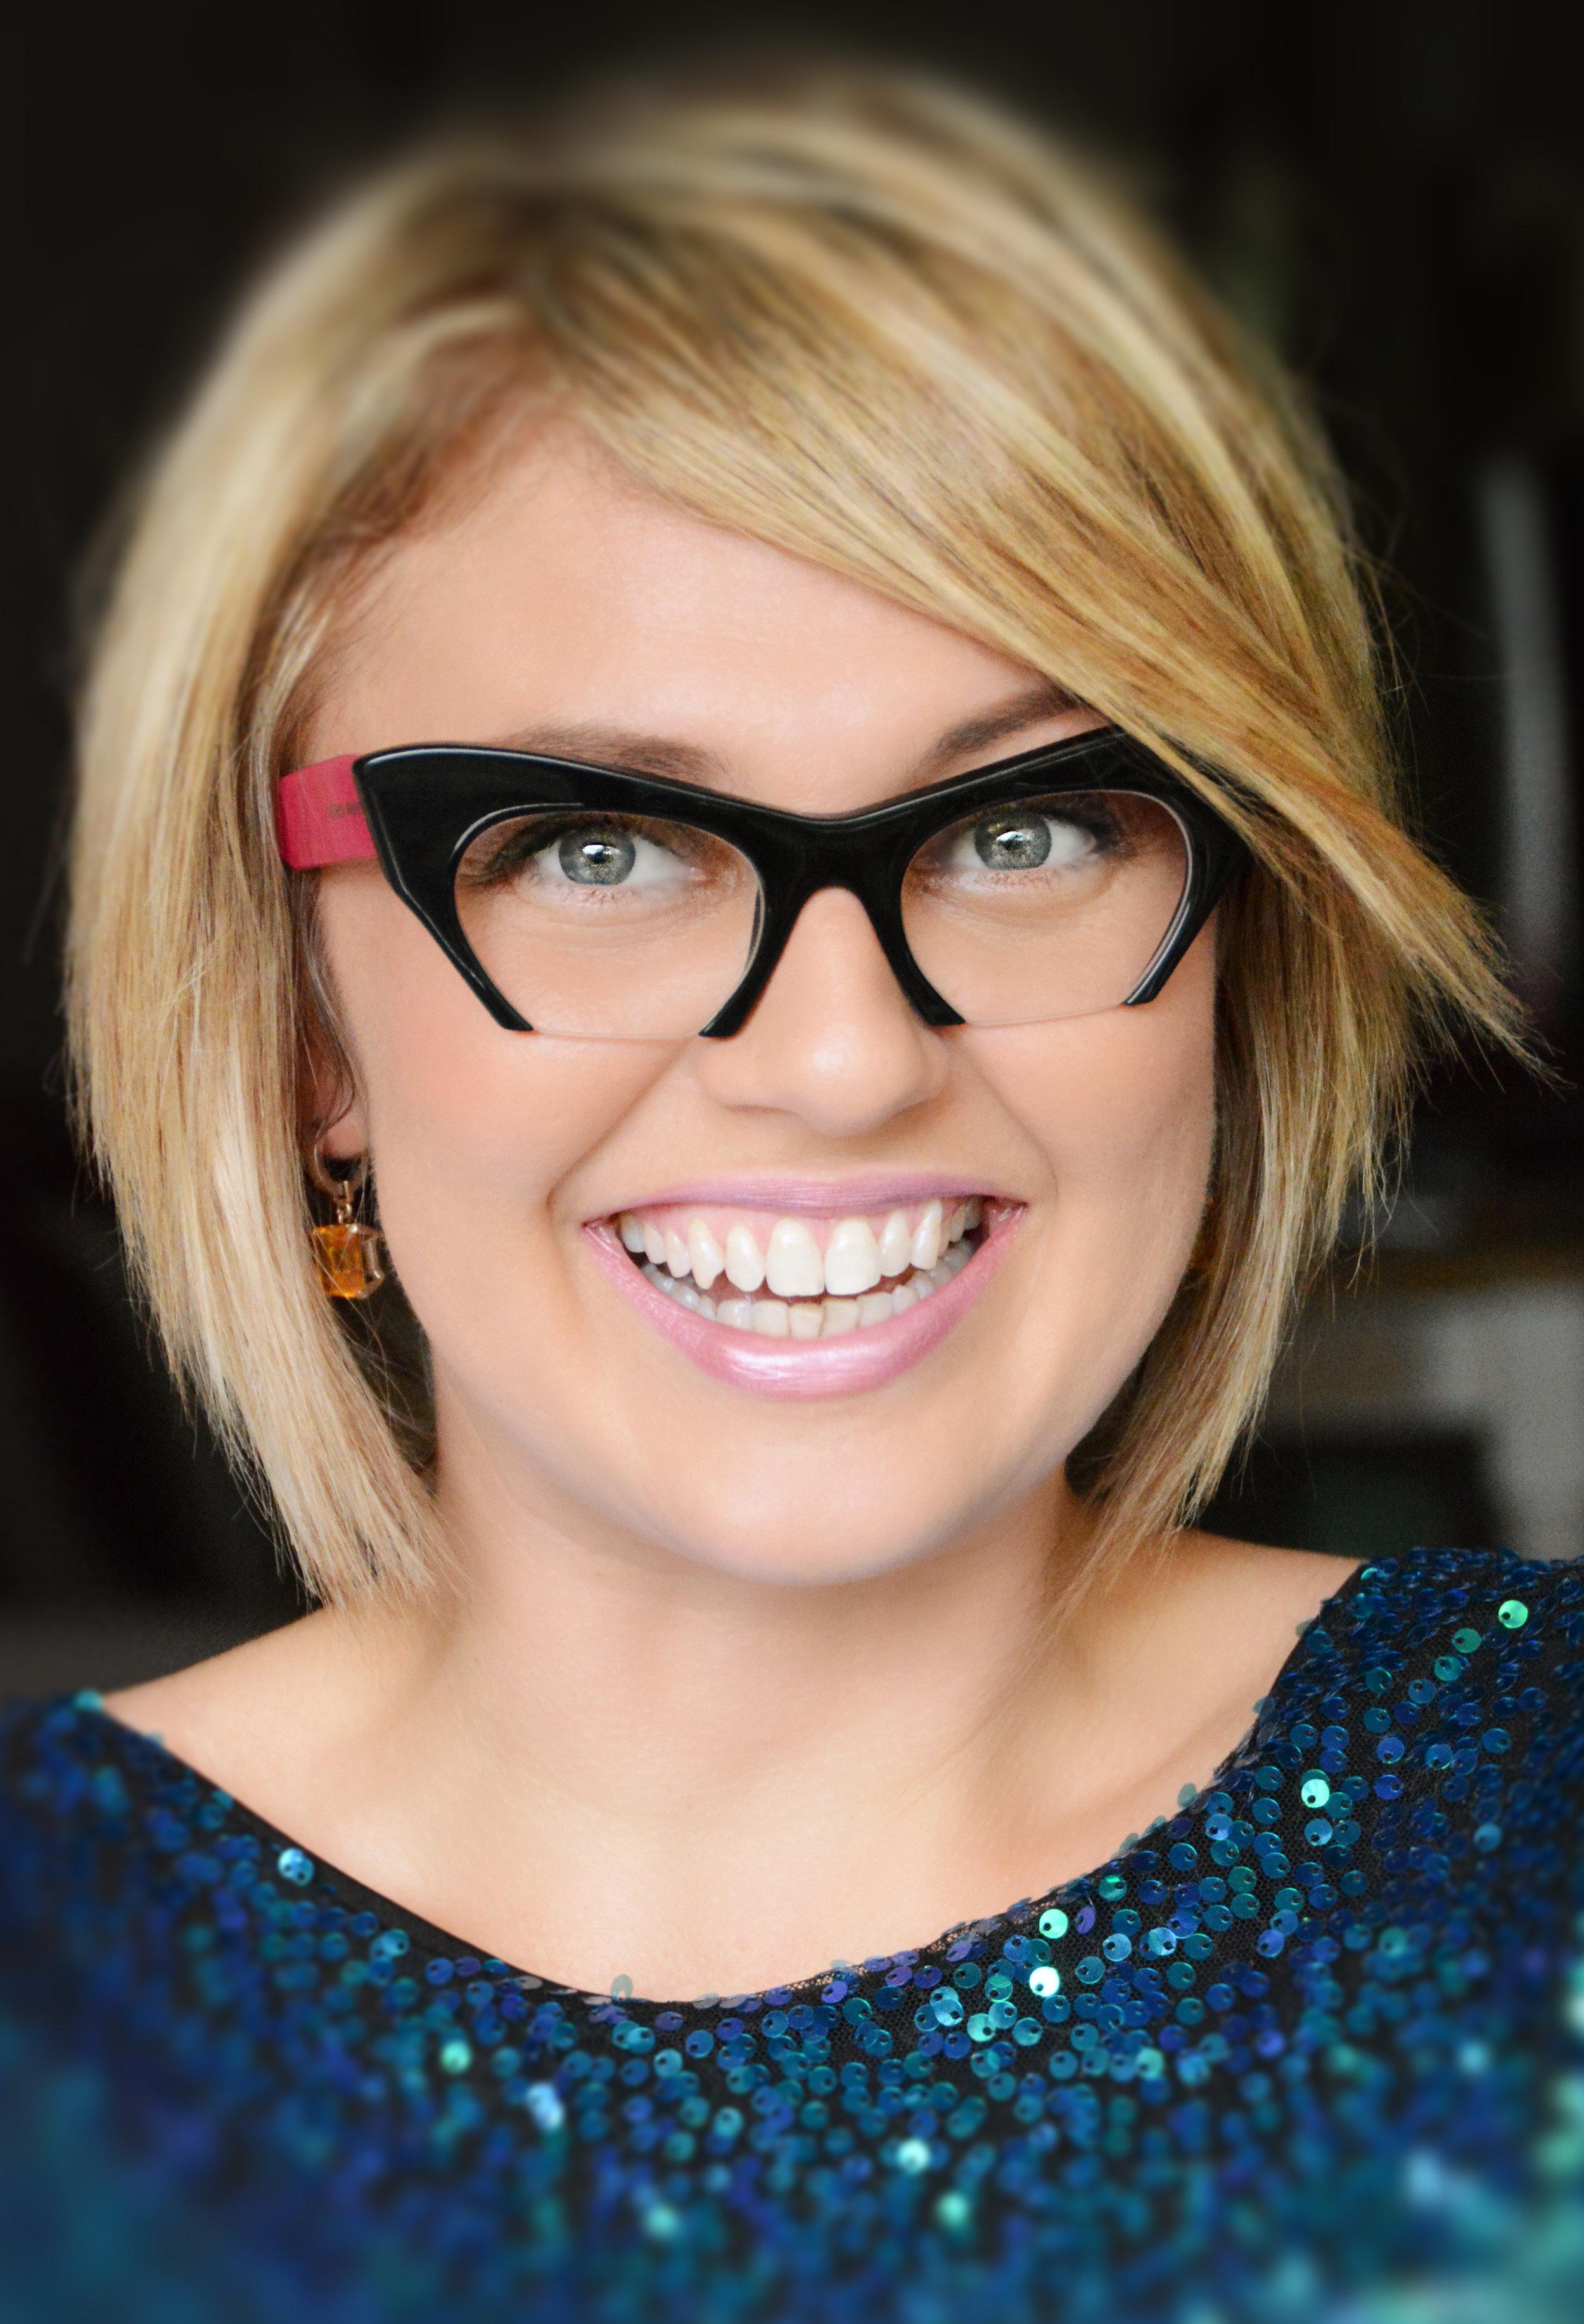 Angela-Nicholson-Photography-Headshot-Sequin.jpg